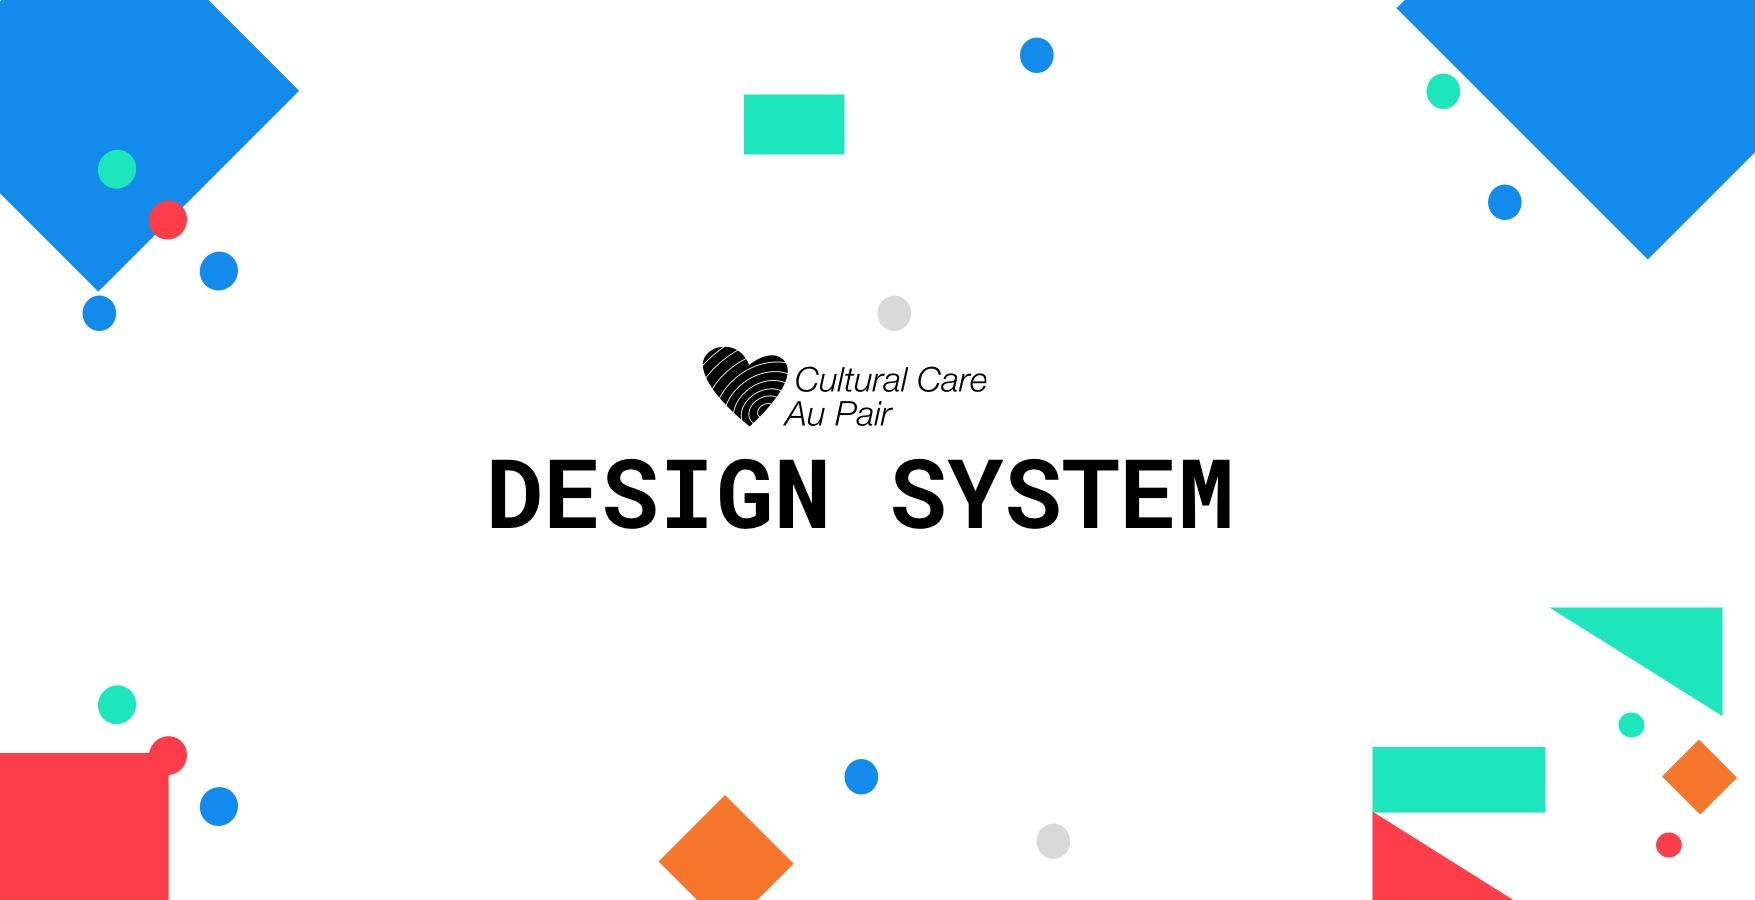 Cultural Care Design System